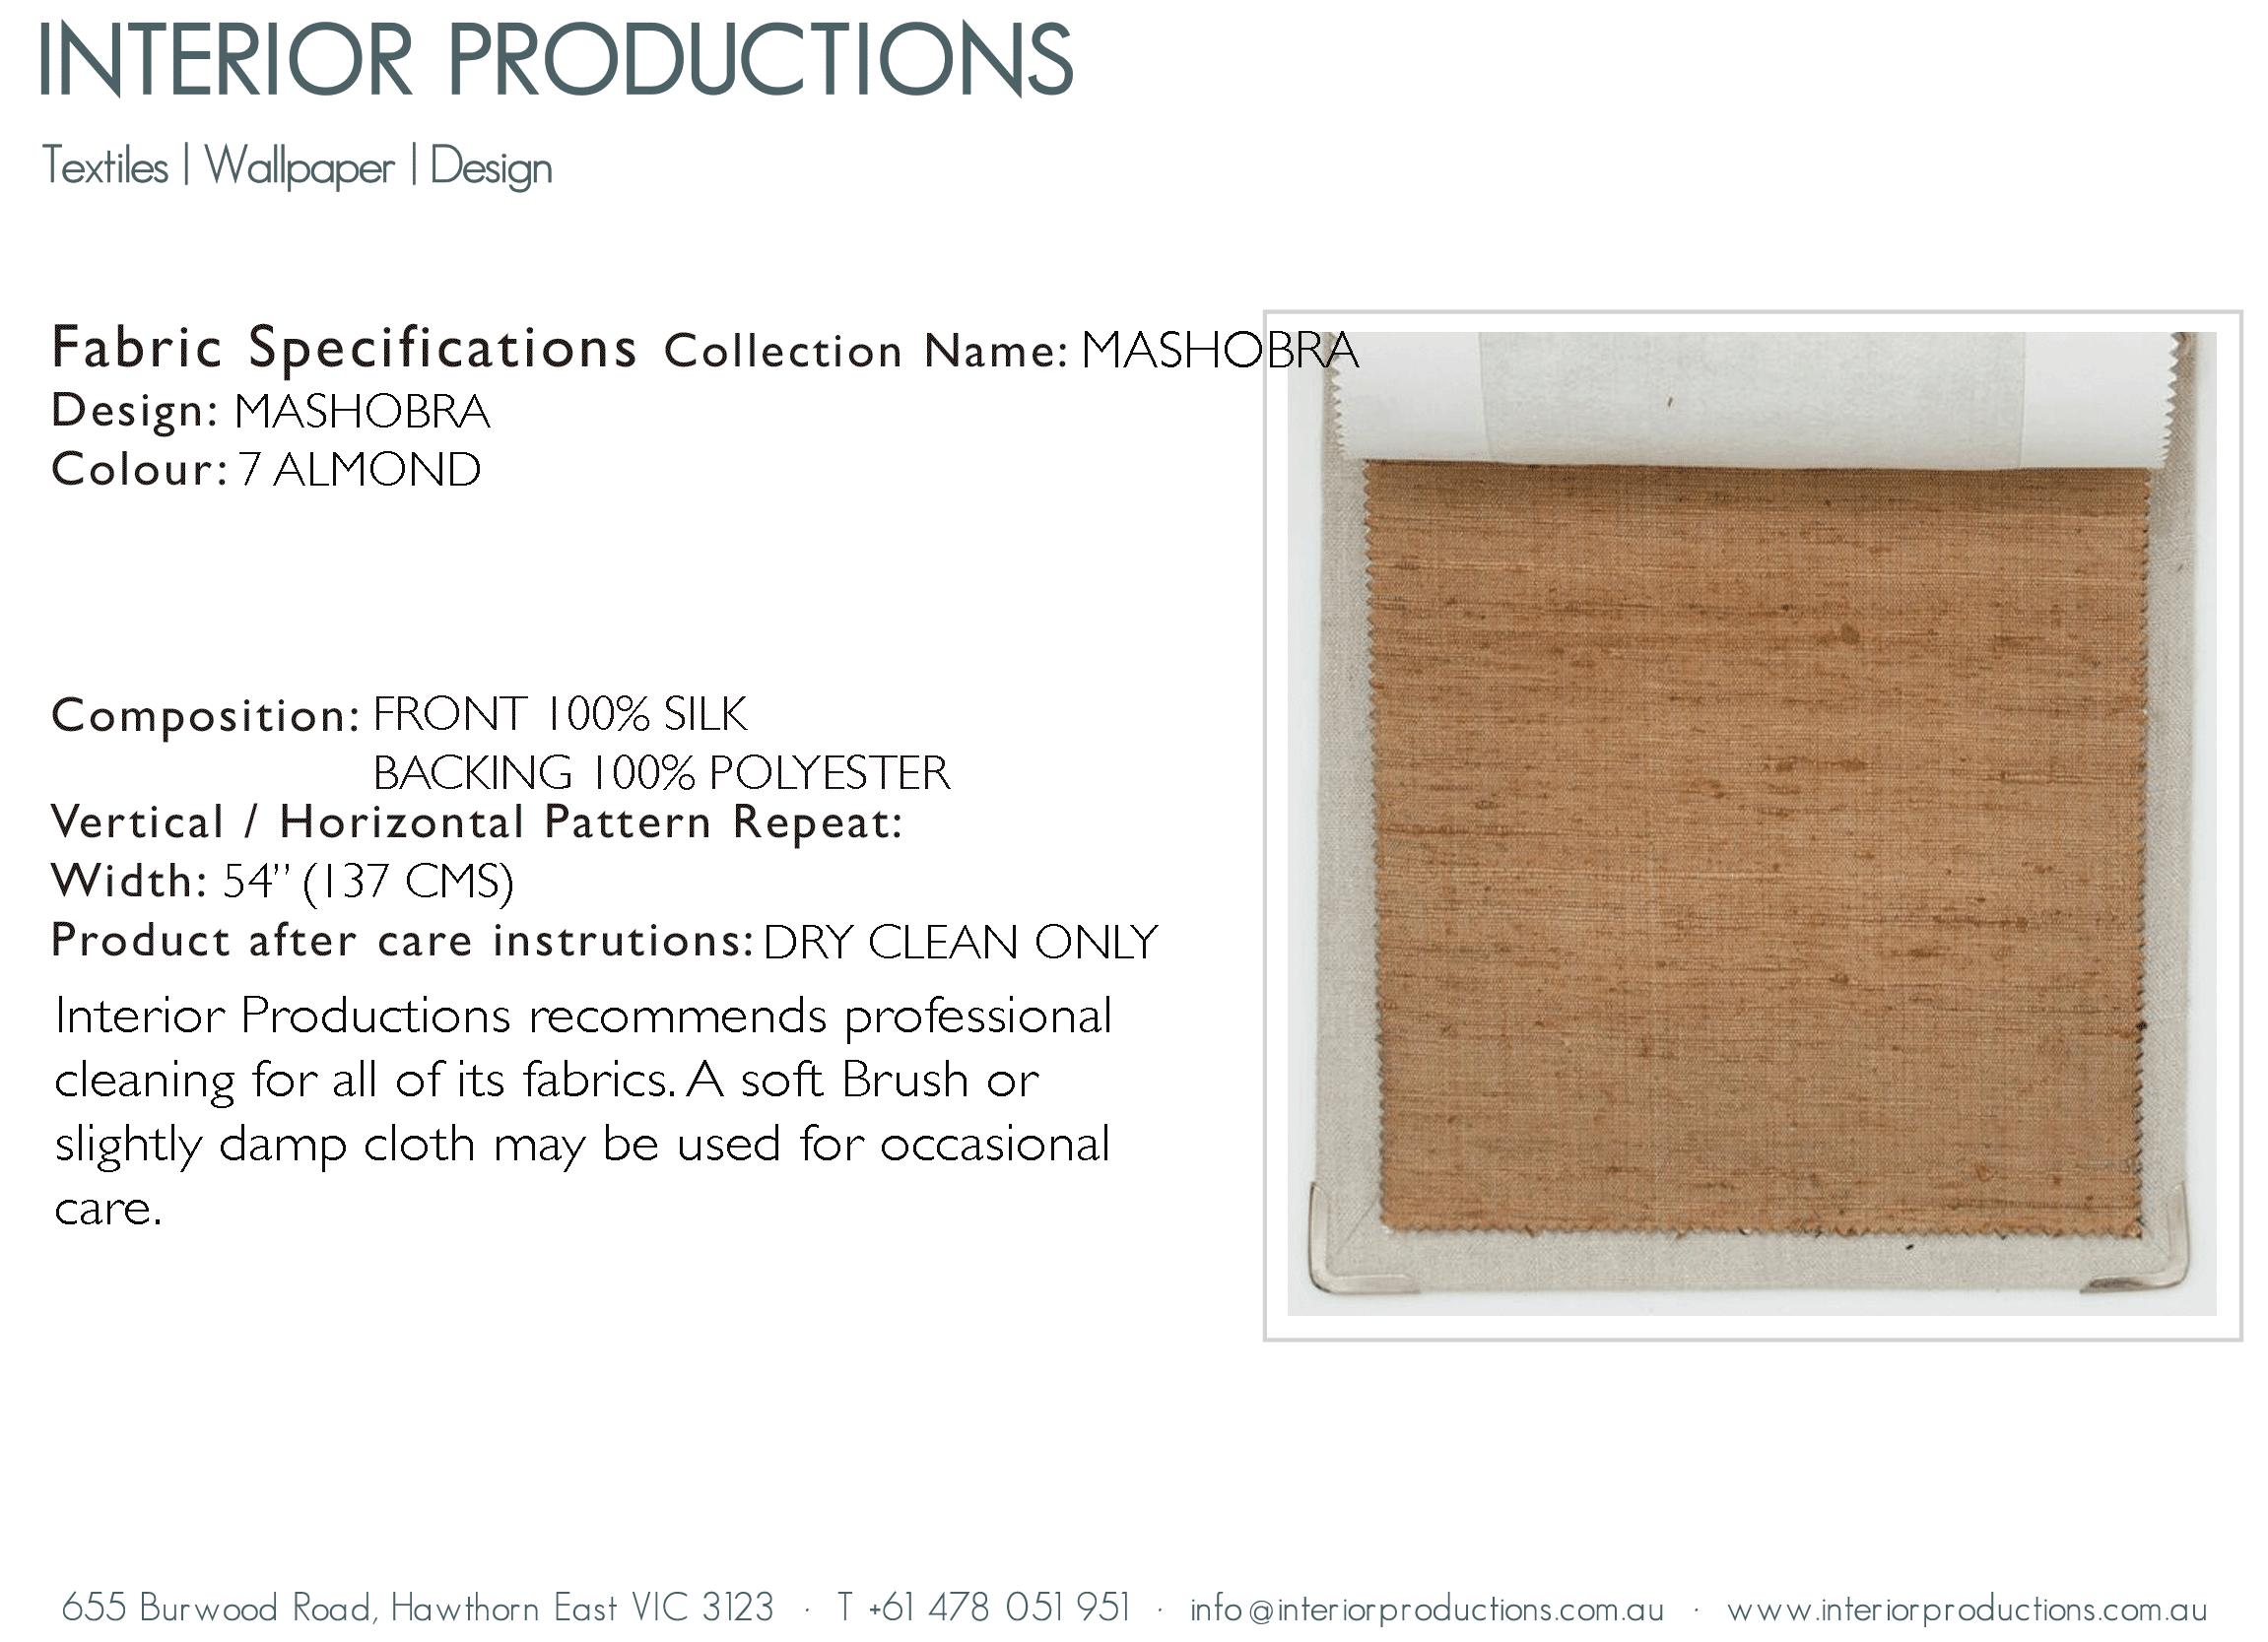 interior_productions_MASHOBRA---7-ALMOND